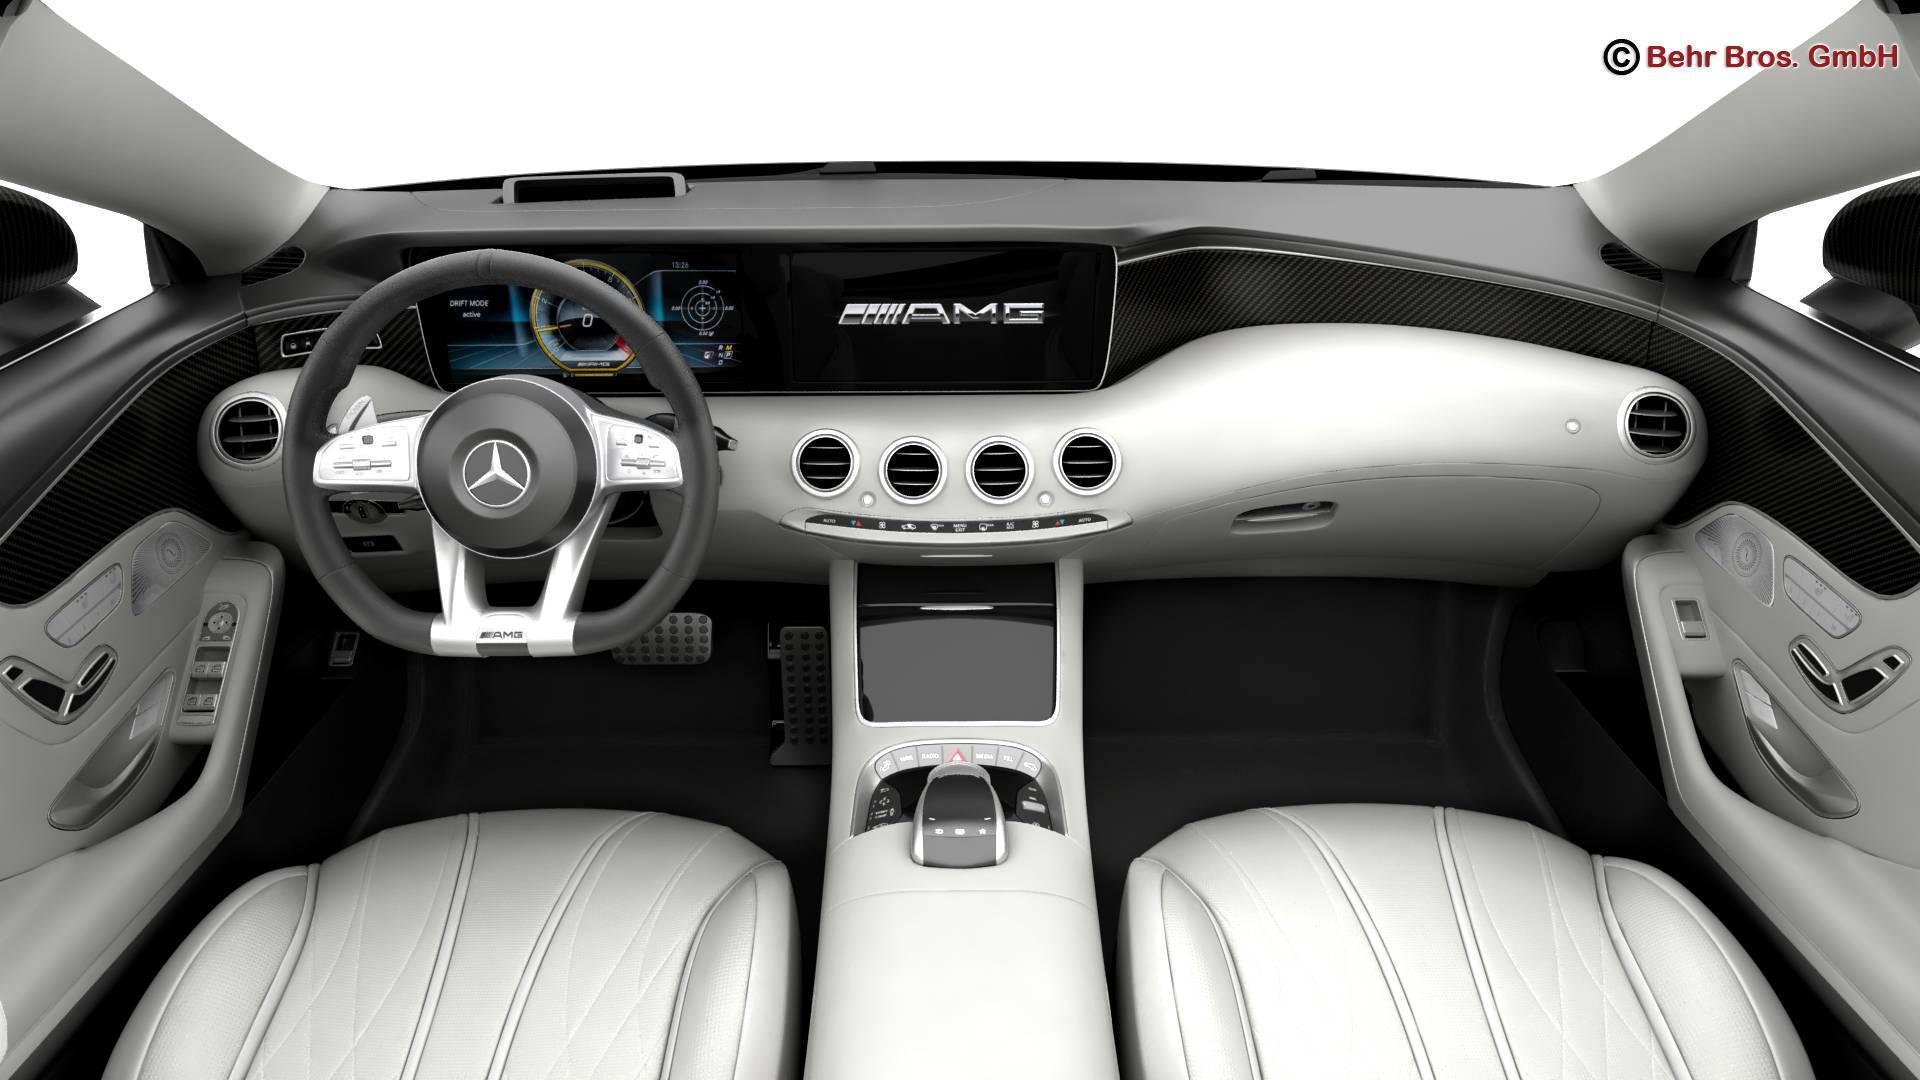 mercedes s class coupe amg s63 2018 3d model 3ds max fbx c4d lwo ma mb obj 274102